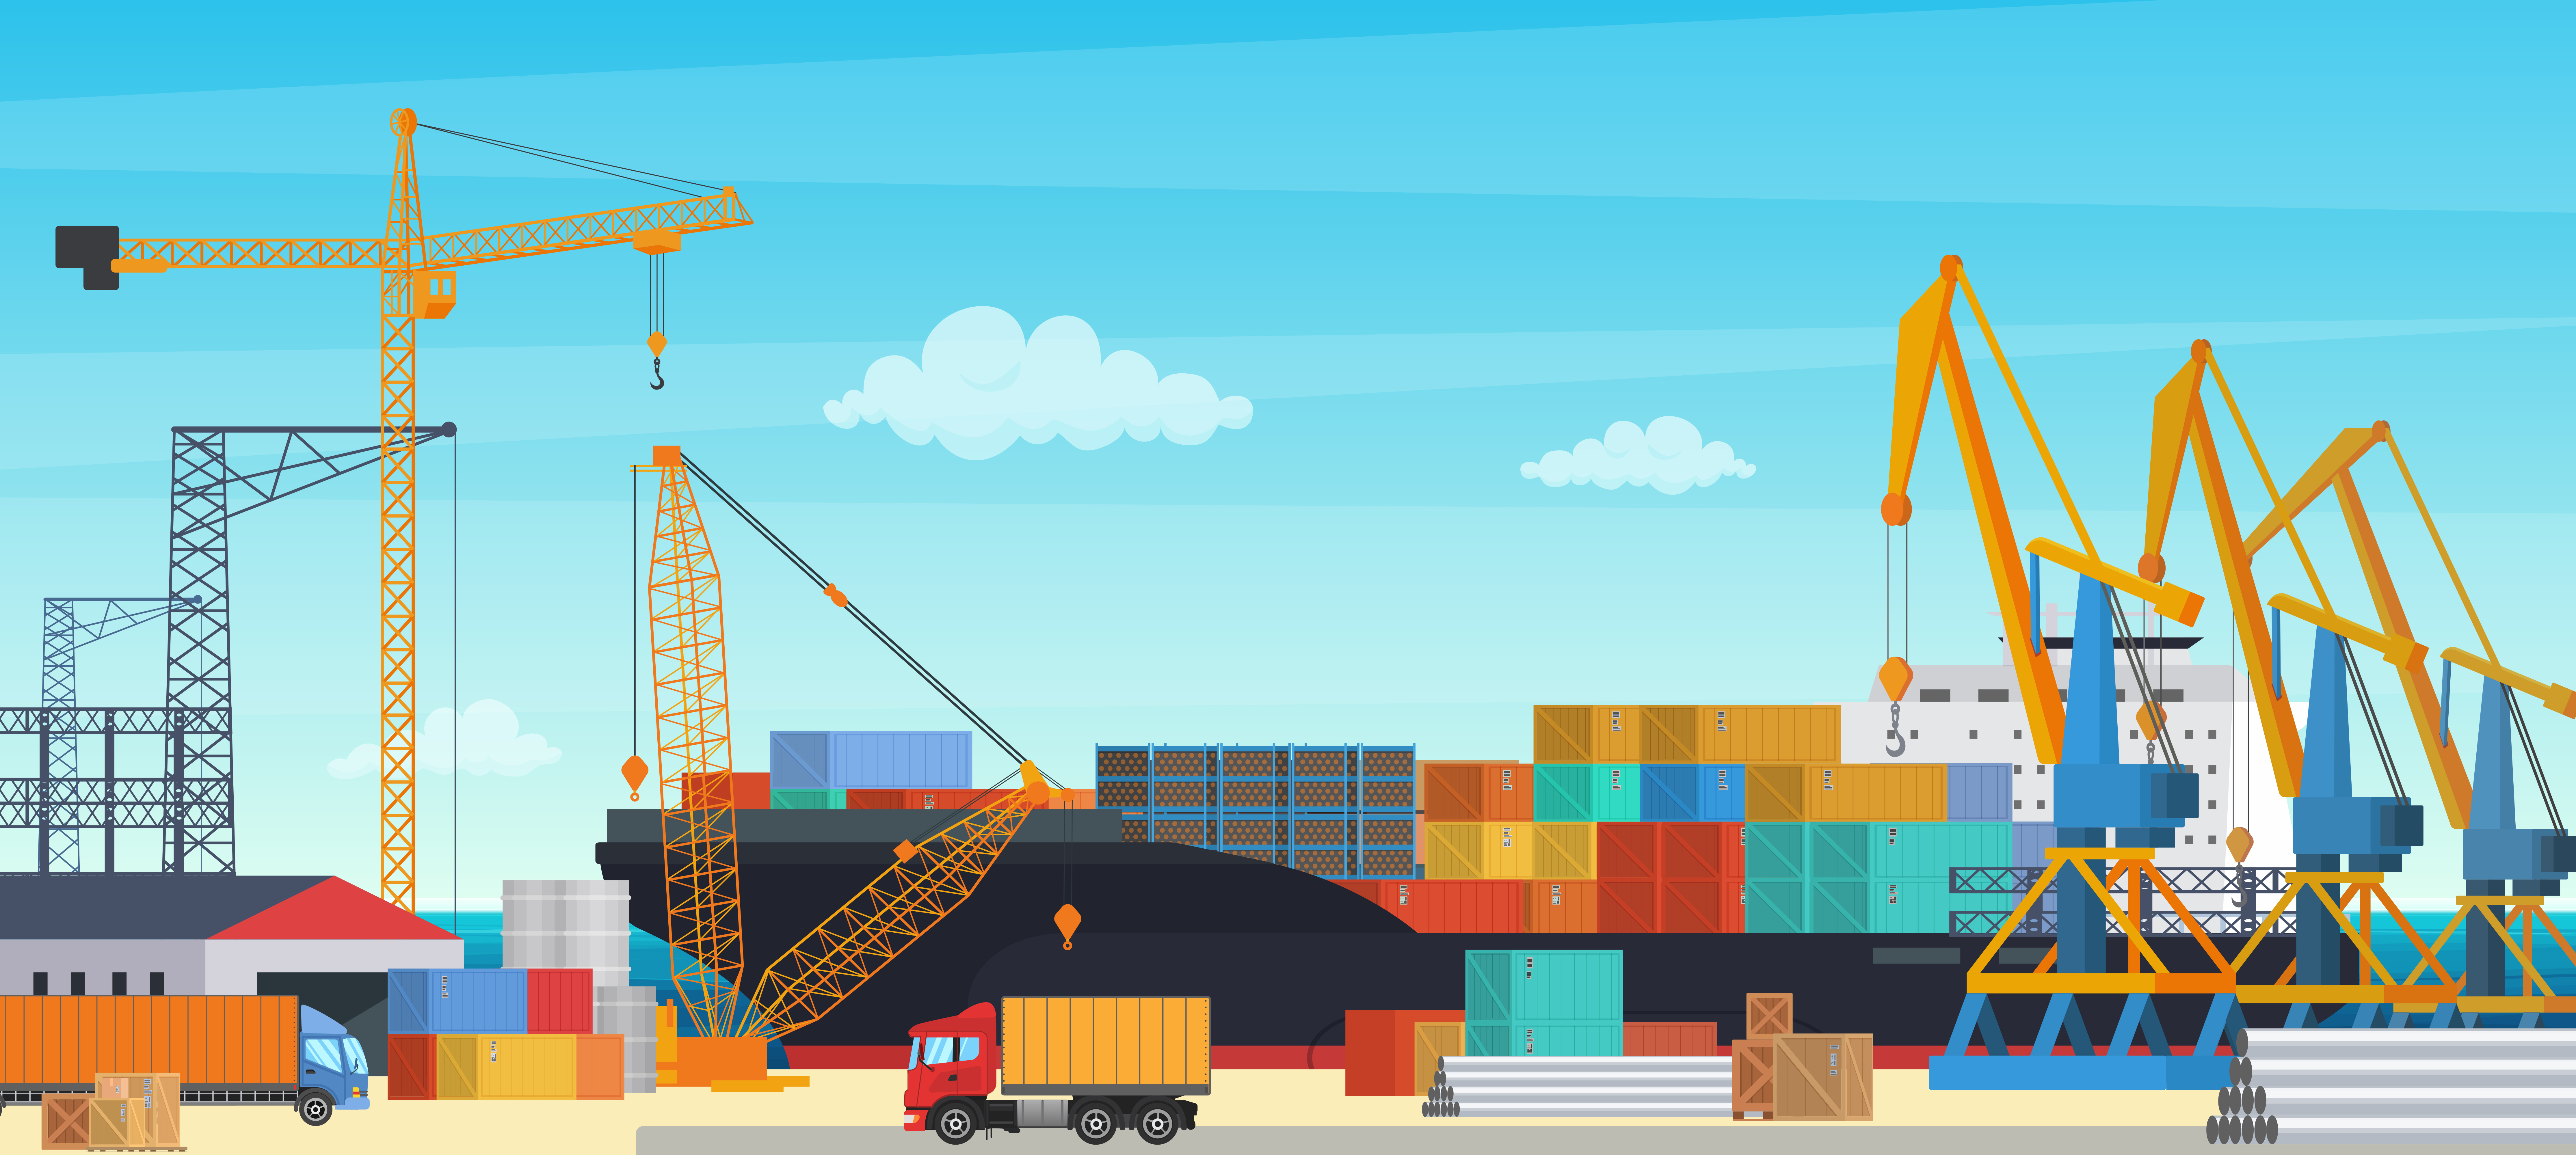 logistics transportationt container ship industrial crane import export shipping cargo harbor yard